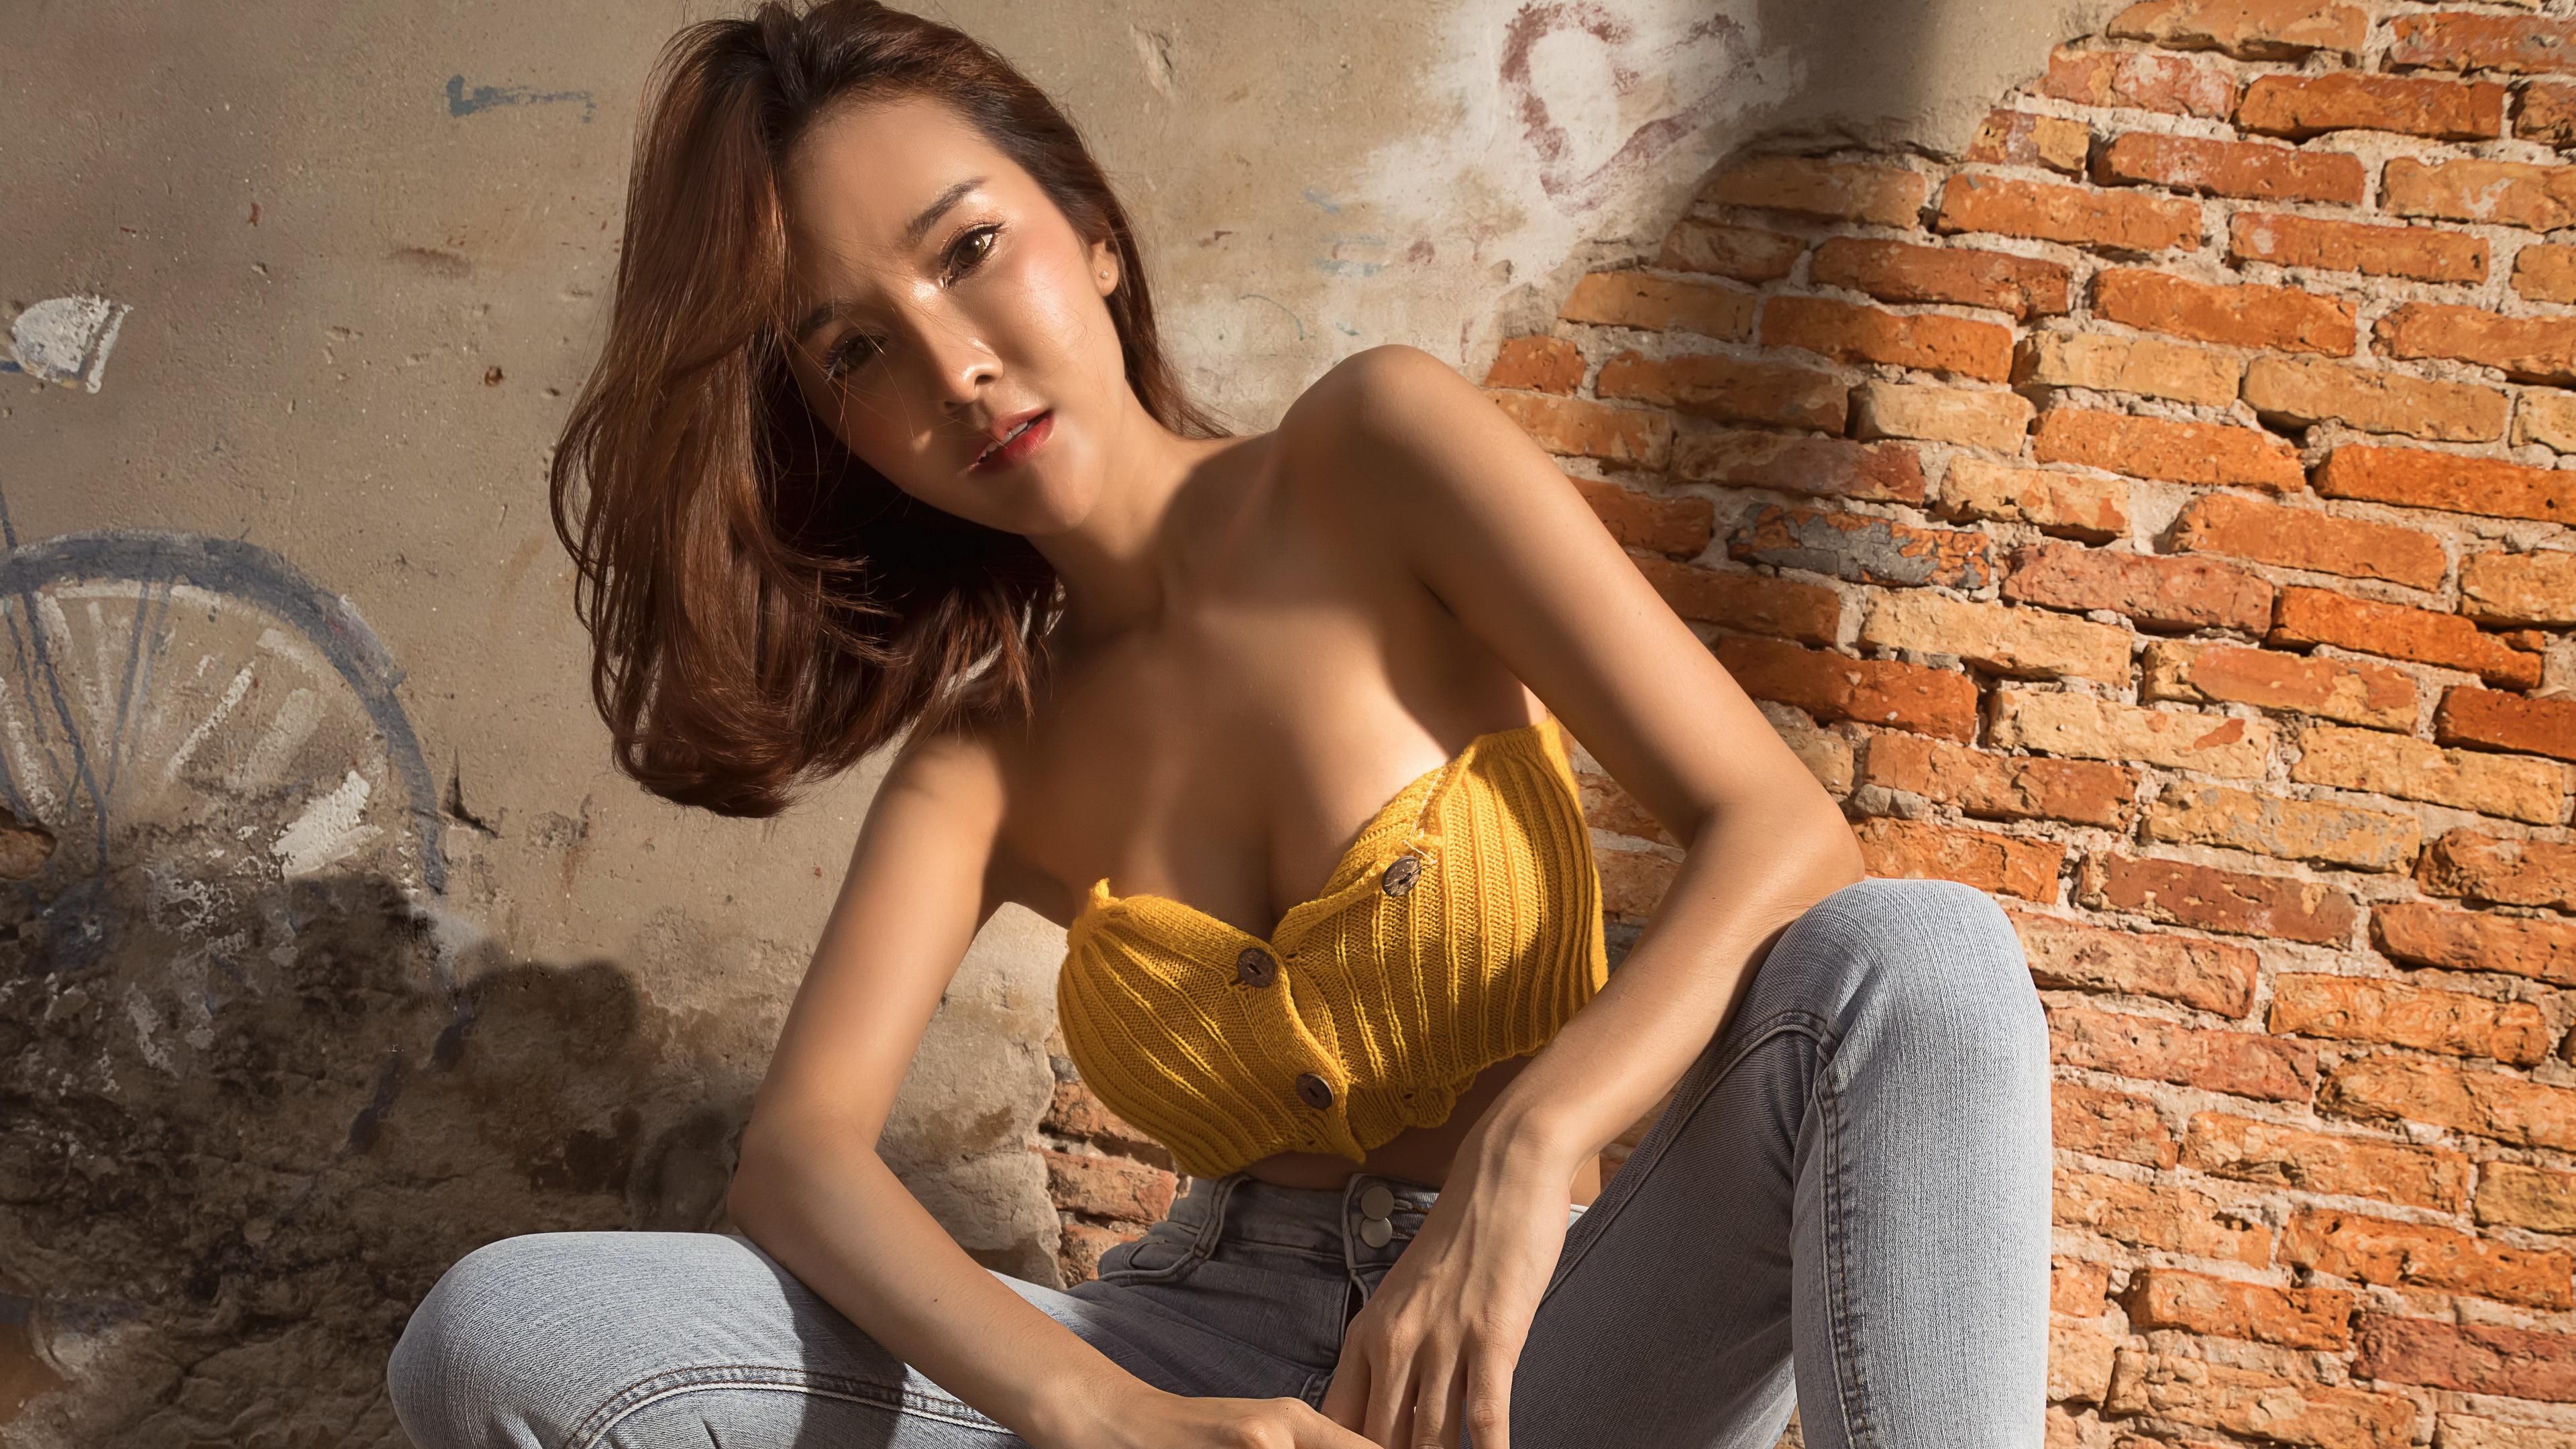 Фотографии шатенки Поза Девушки азиатка из кирпича рука стенка сидящие смотрят 3840x2160 Шатенка позирует девушка молодая женщина молодые женщины Азиаты азиатки Кирпичный Руки сидя Сидит Стена стены стене Взгляд смотрит